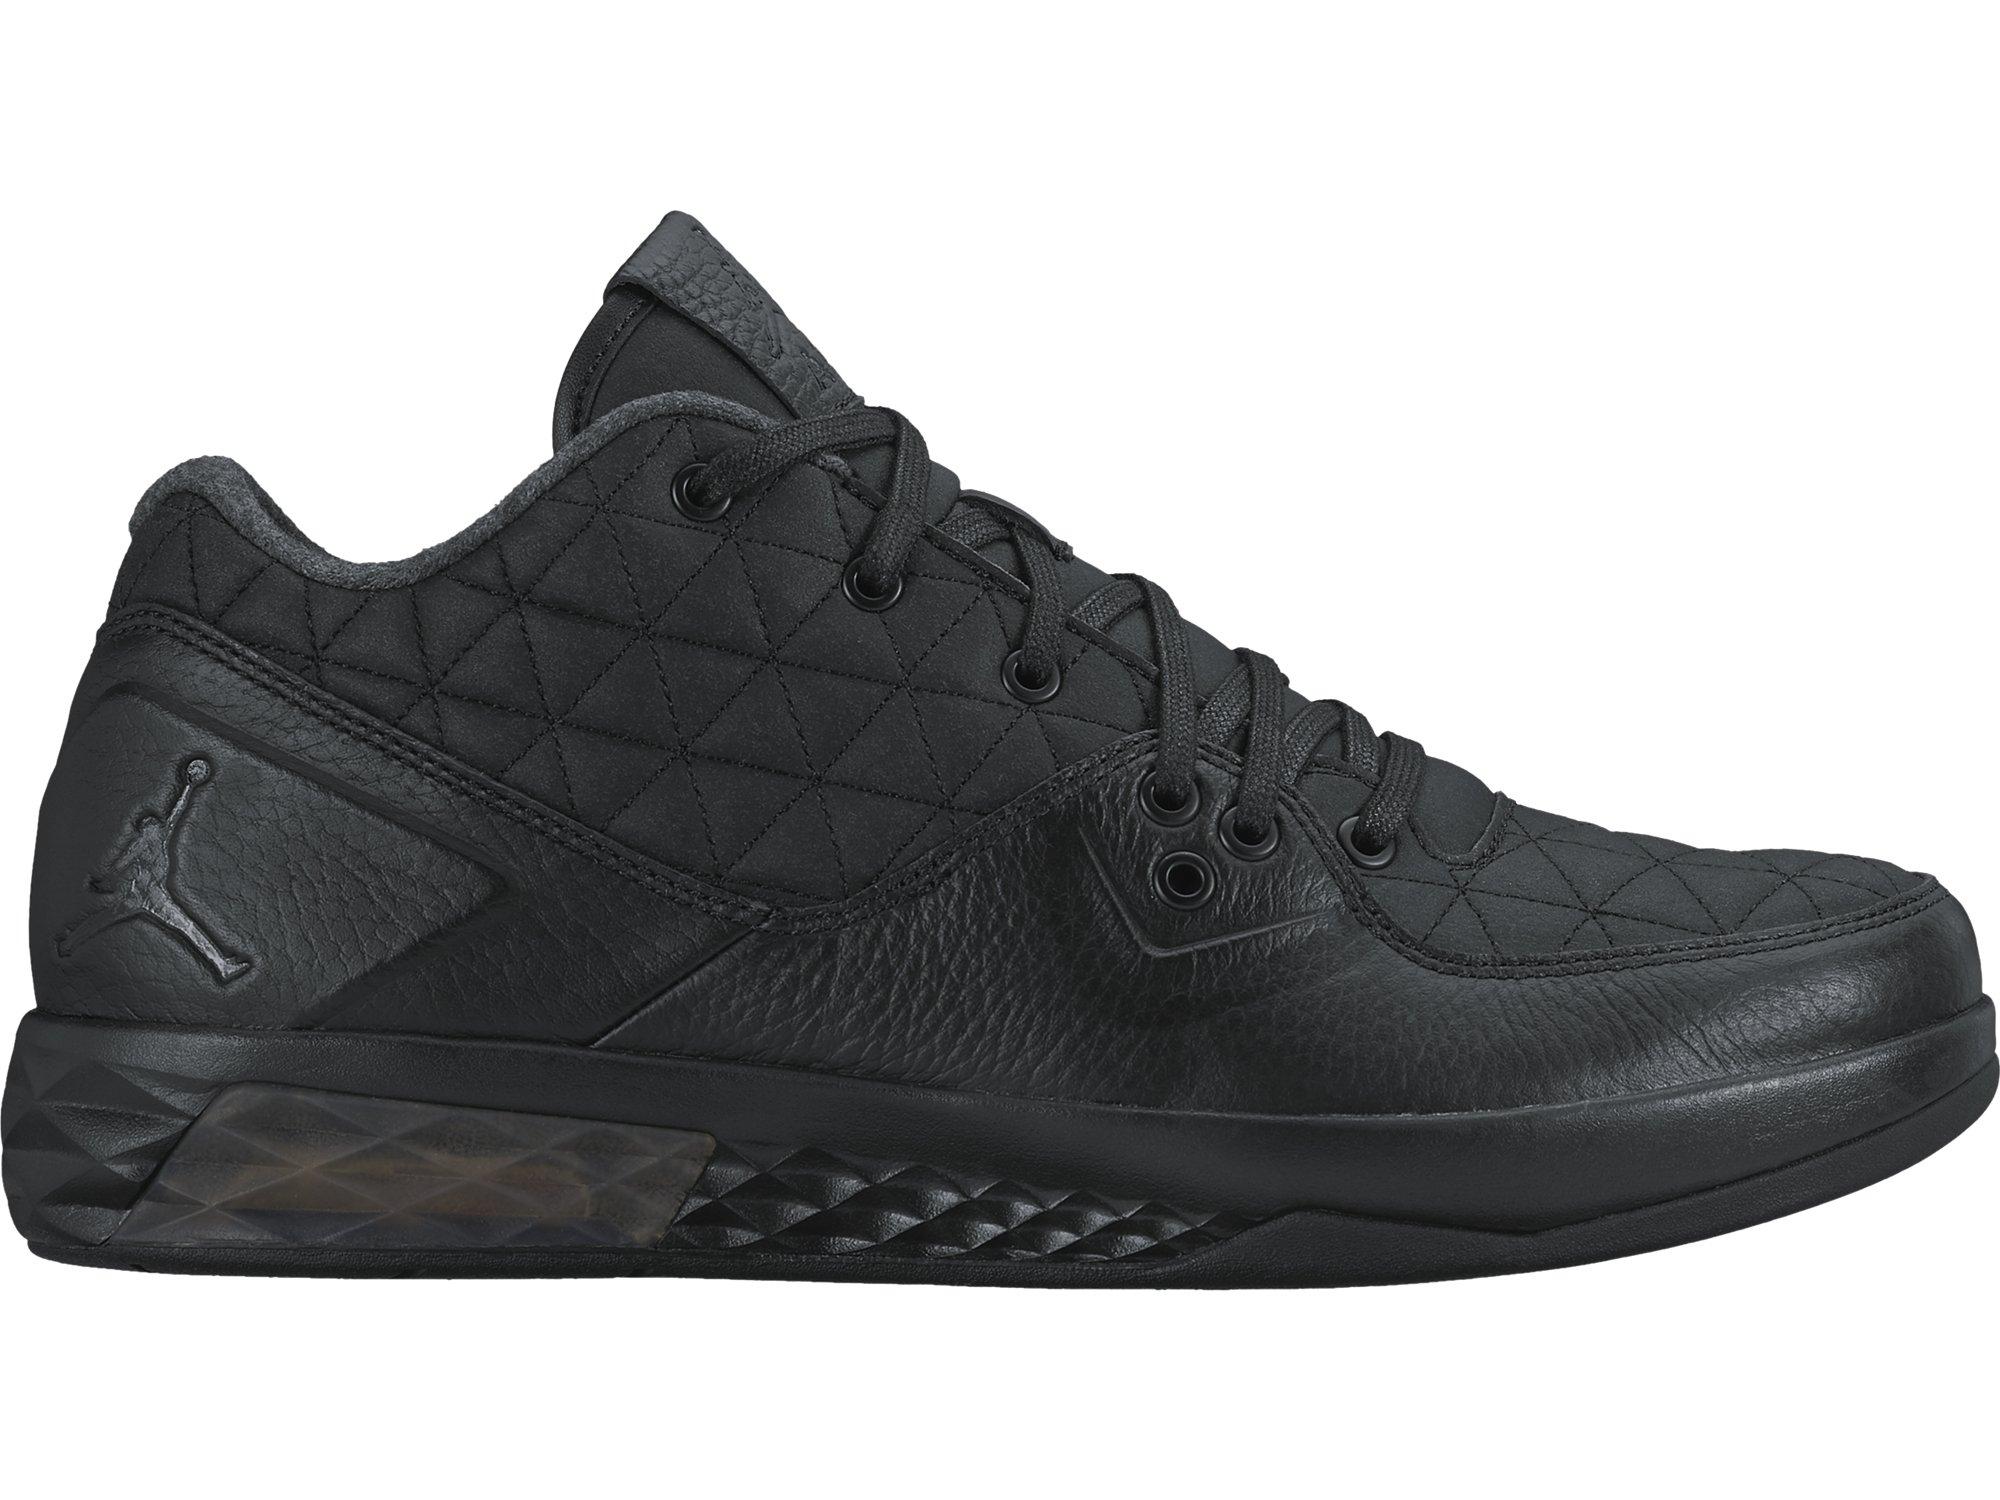 Galleon - Nike Mens Jordan Clutch Basketball Shoe Black Black-Gym Red 9.5 e24dd810f